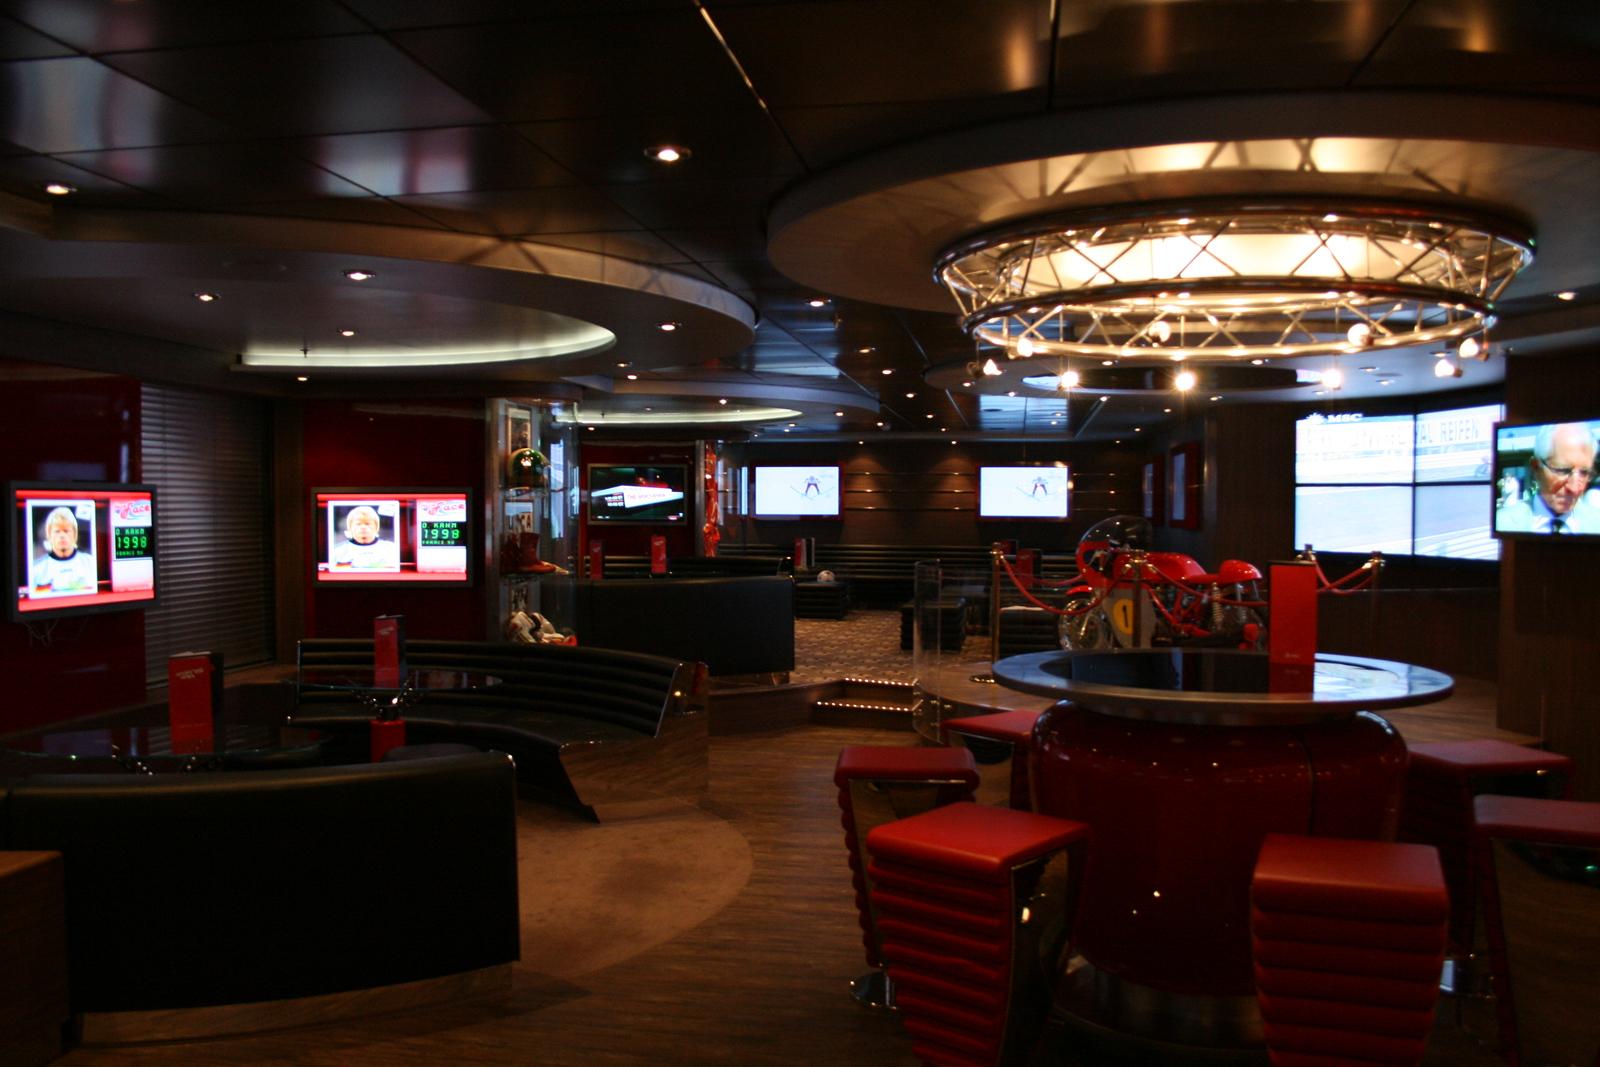 2009 - On board MSC FANTASIA : Sports bar.